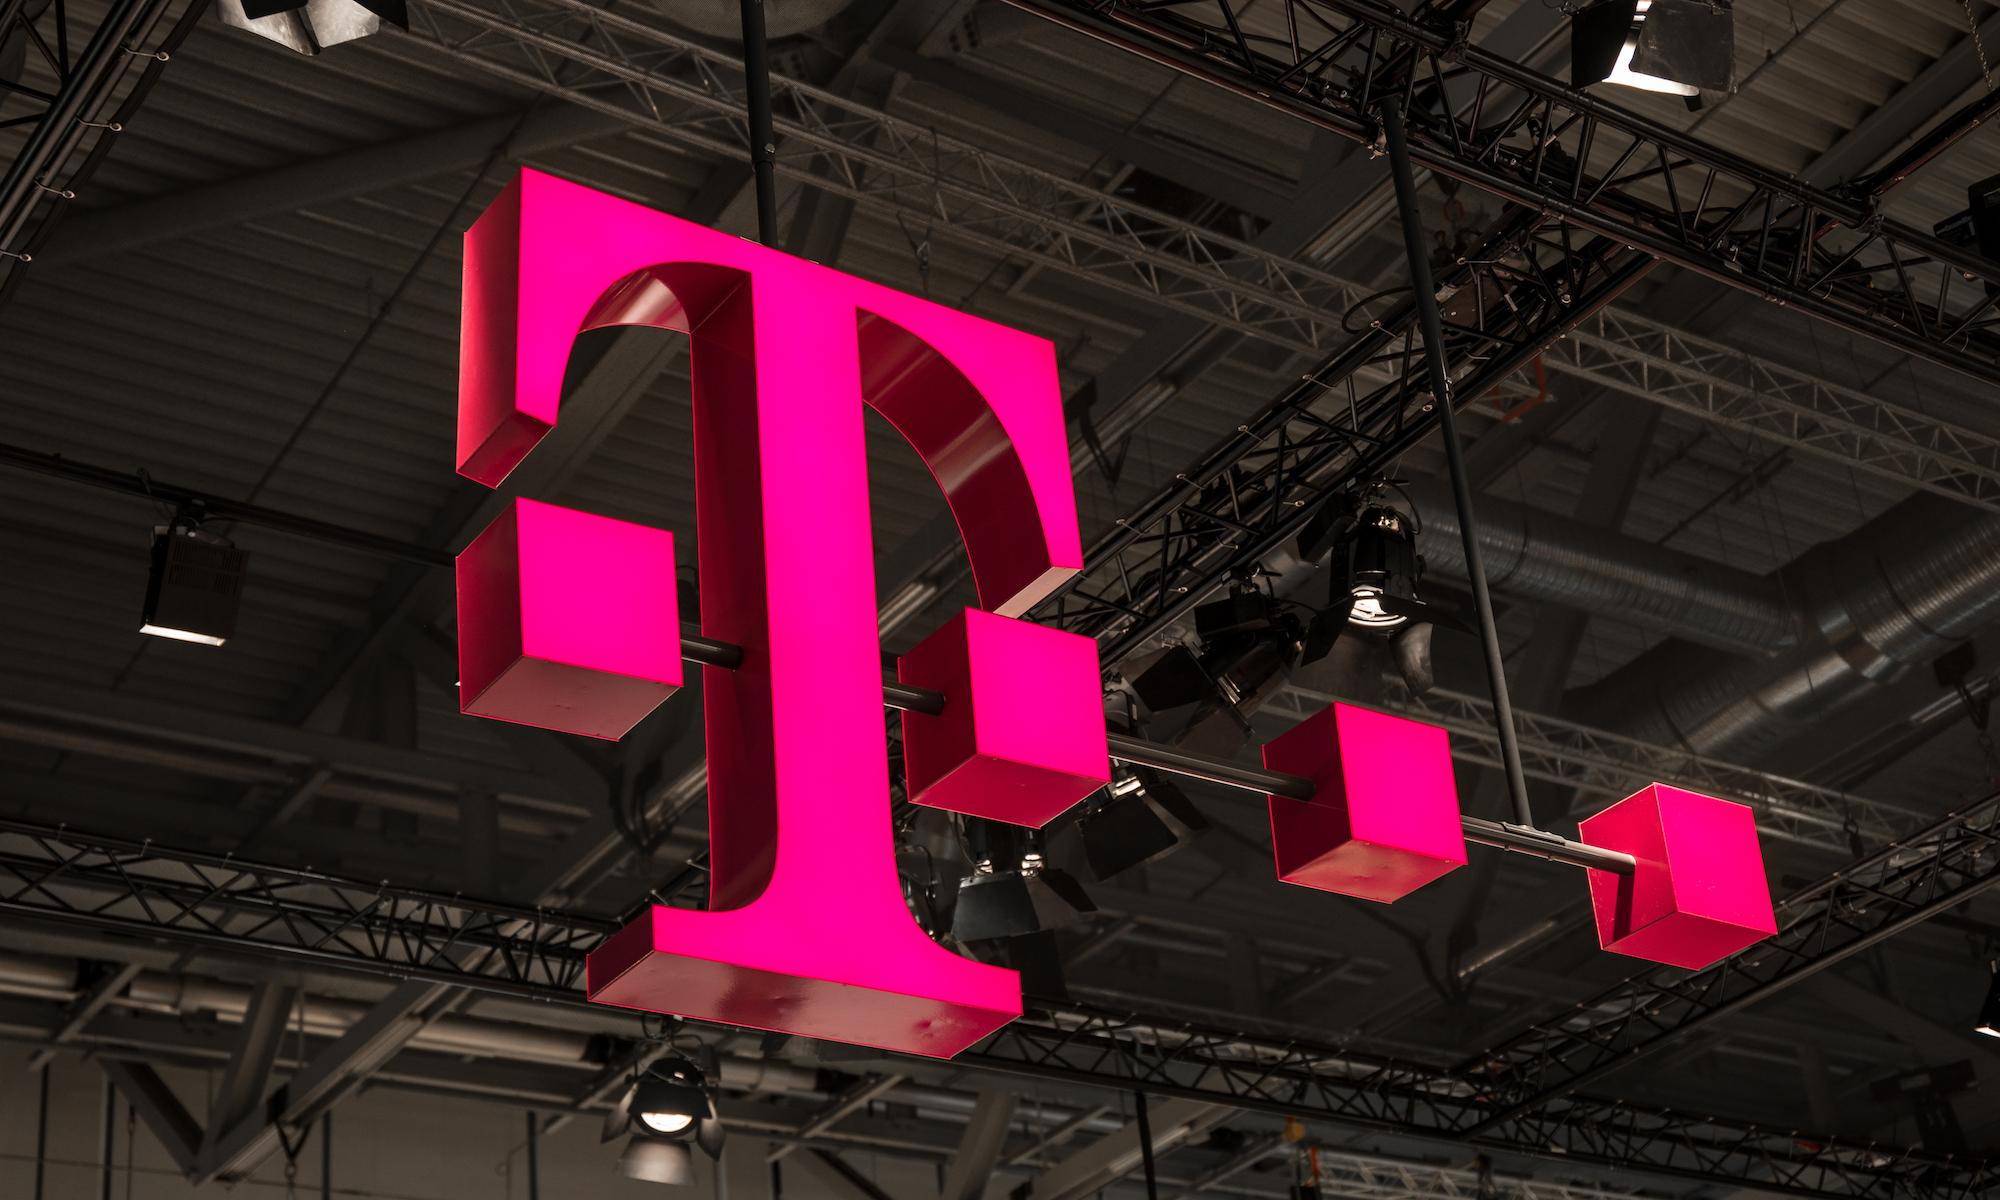 Germany Blocks its Largest Telecom Company From Violating Net Neutrality